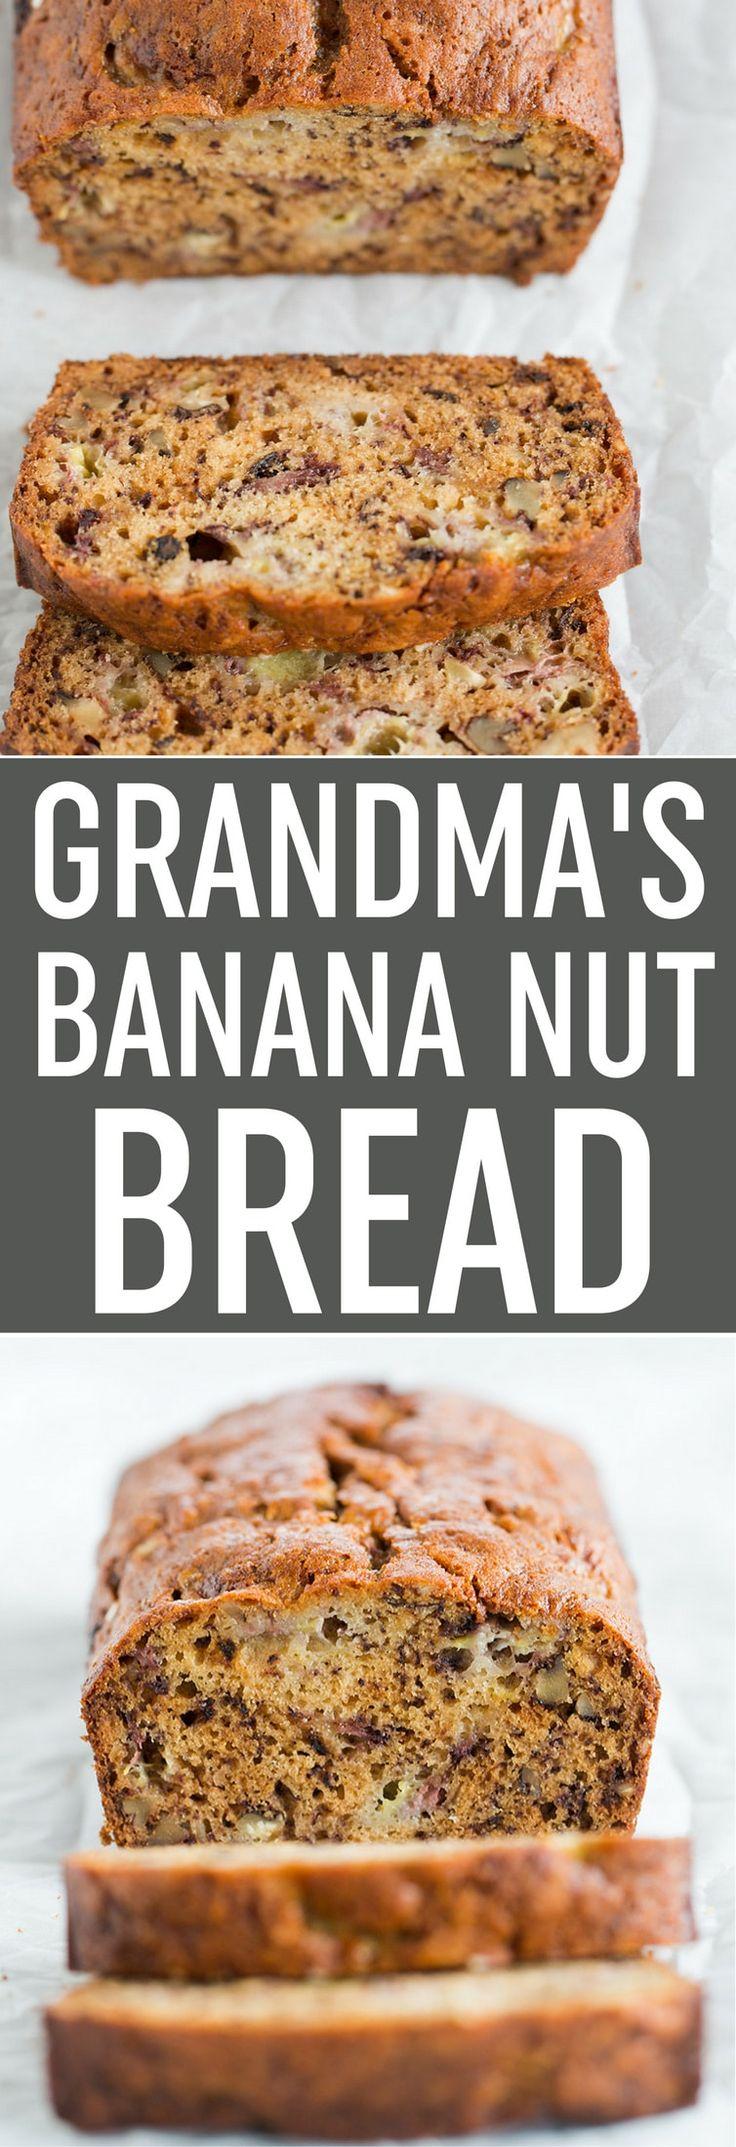 Grandma's Banana Nut Bread - My grandma's classic banana bread recipe, loaded with mashed bananas and chopped walnuts; super moist and so easy to make. A family favorite! via @browneyedbaker